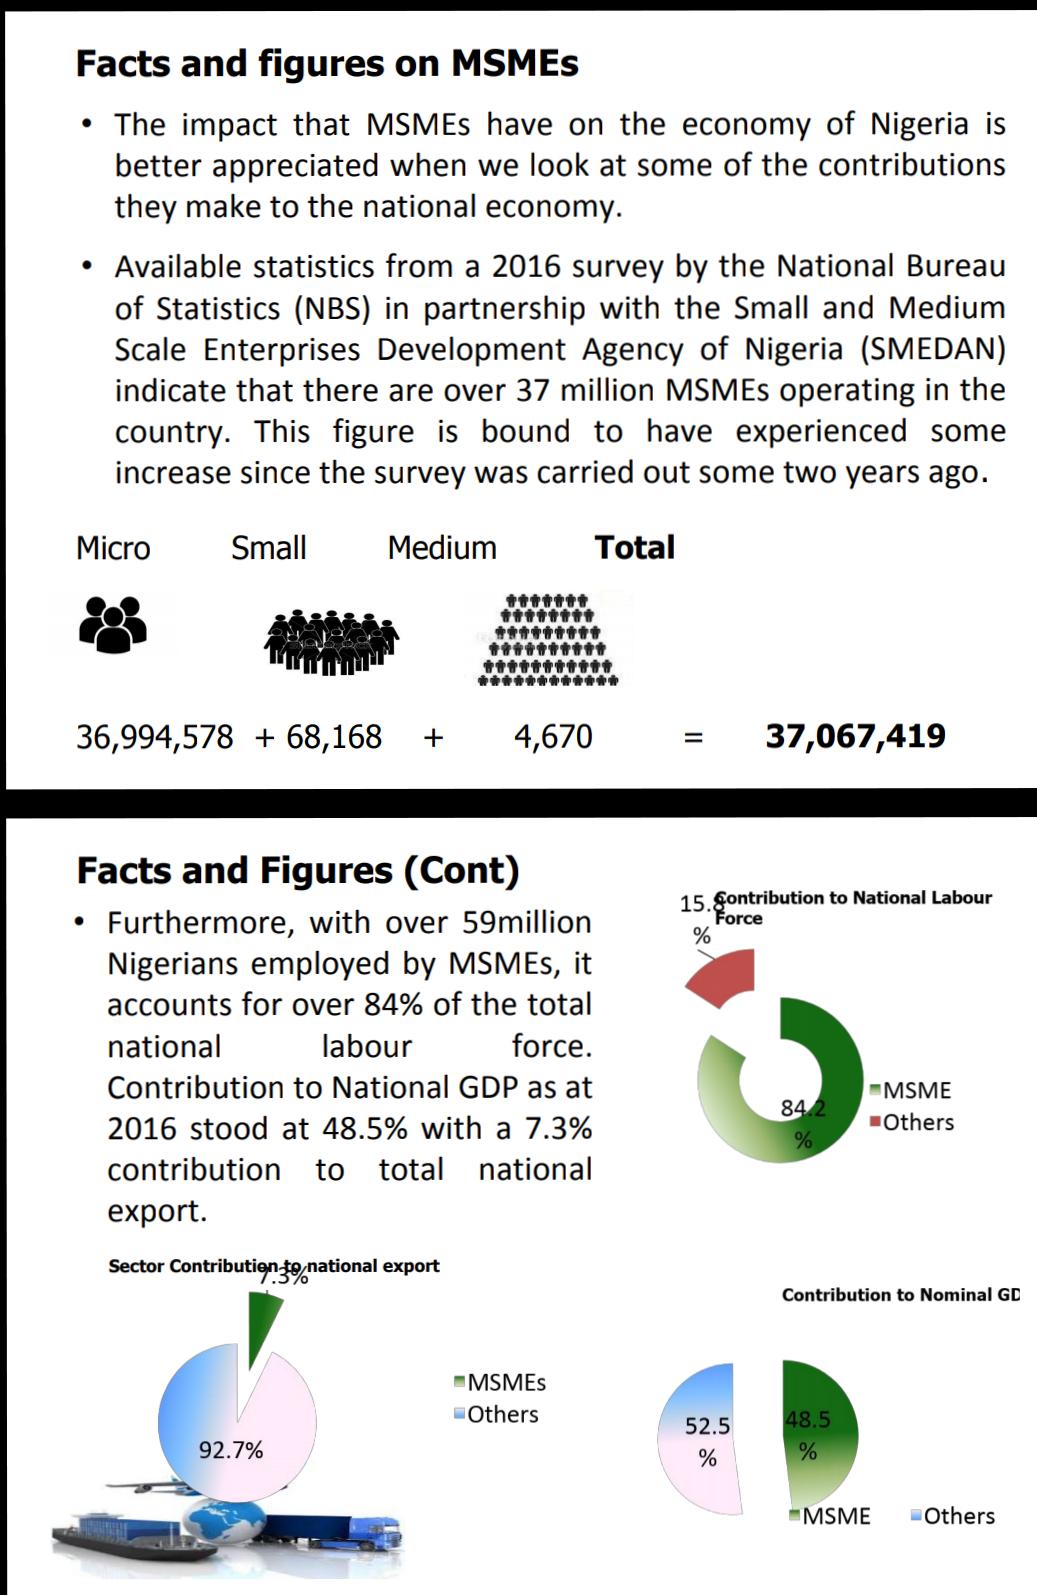 Why FIRS, JTB, SMEDAN focus on sensitizing over 37million MSMEs in Nigeria—by JTB, Secretary